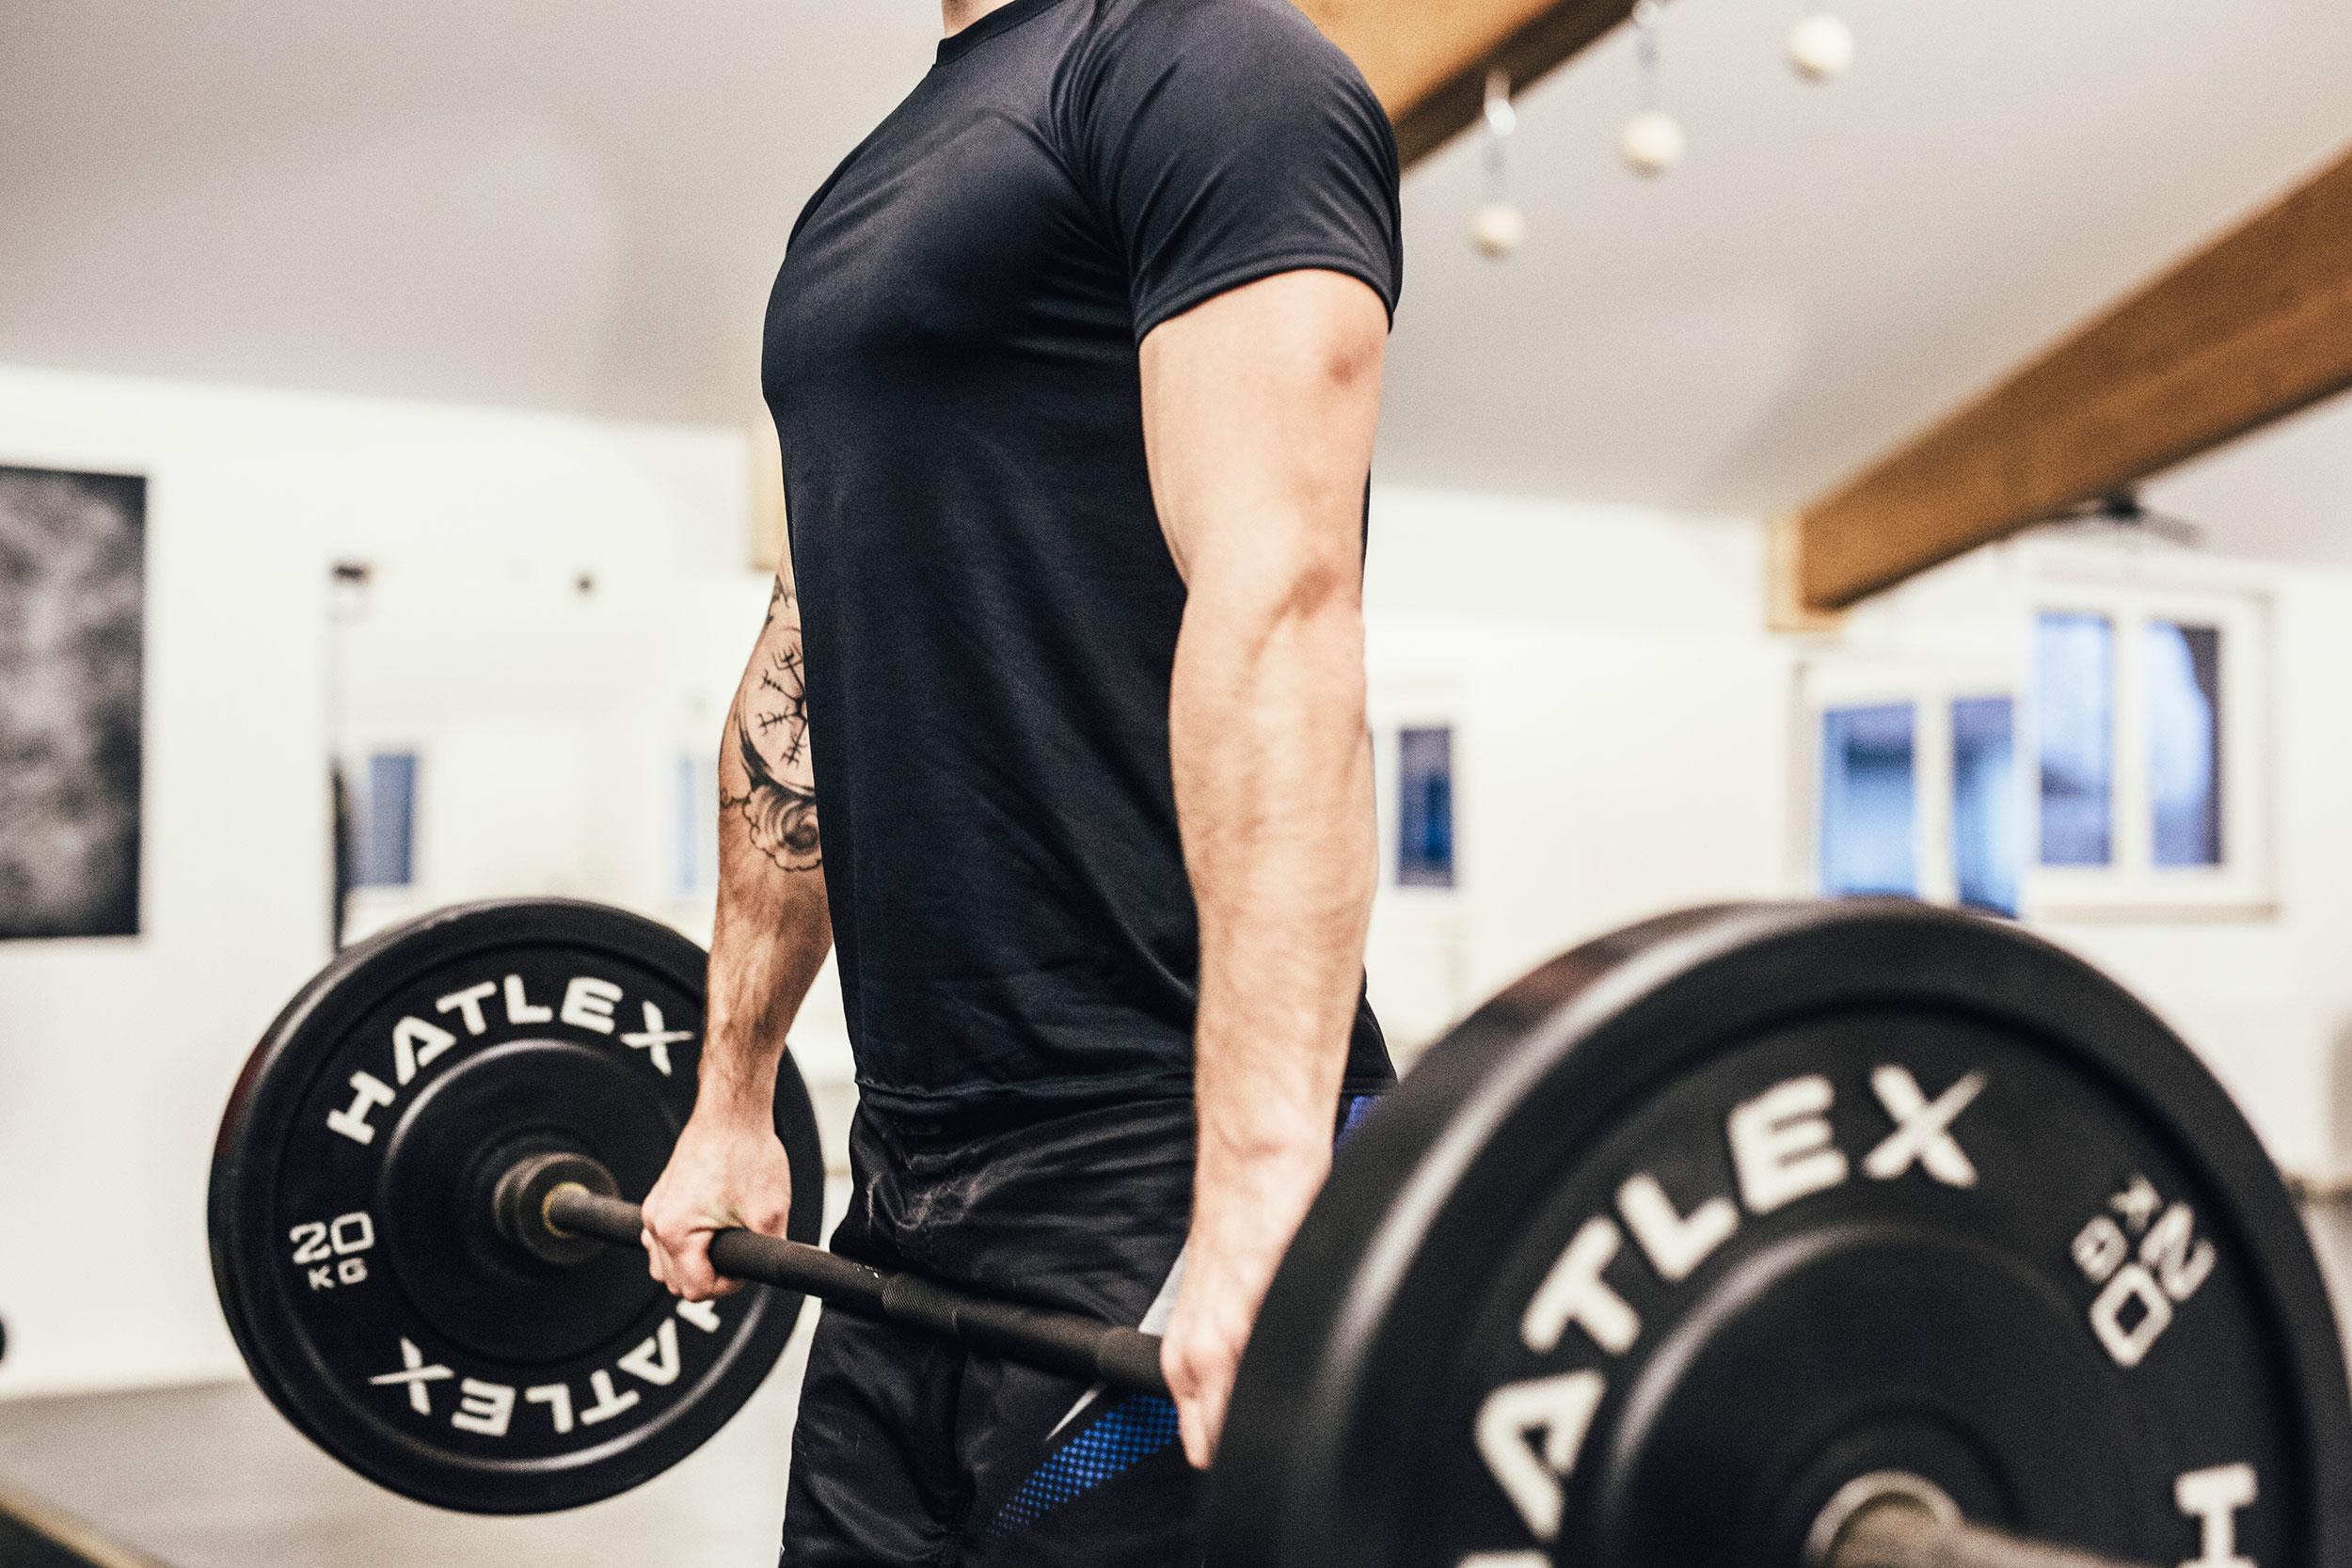 Athletic - Kraftvoller mit gezieltem muskelaufbau training